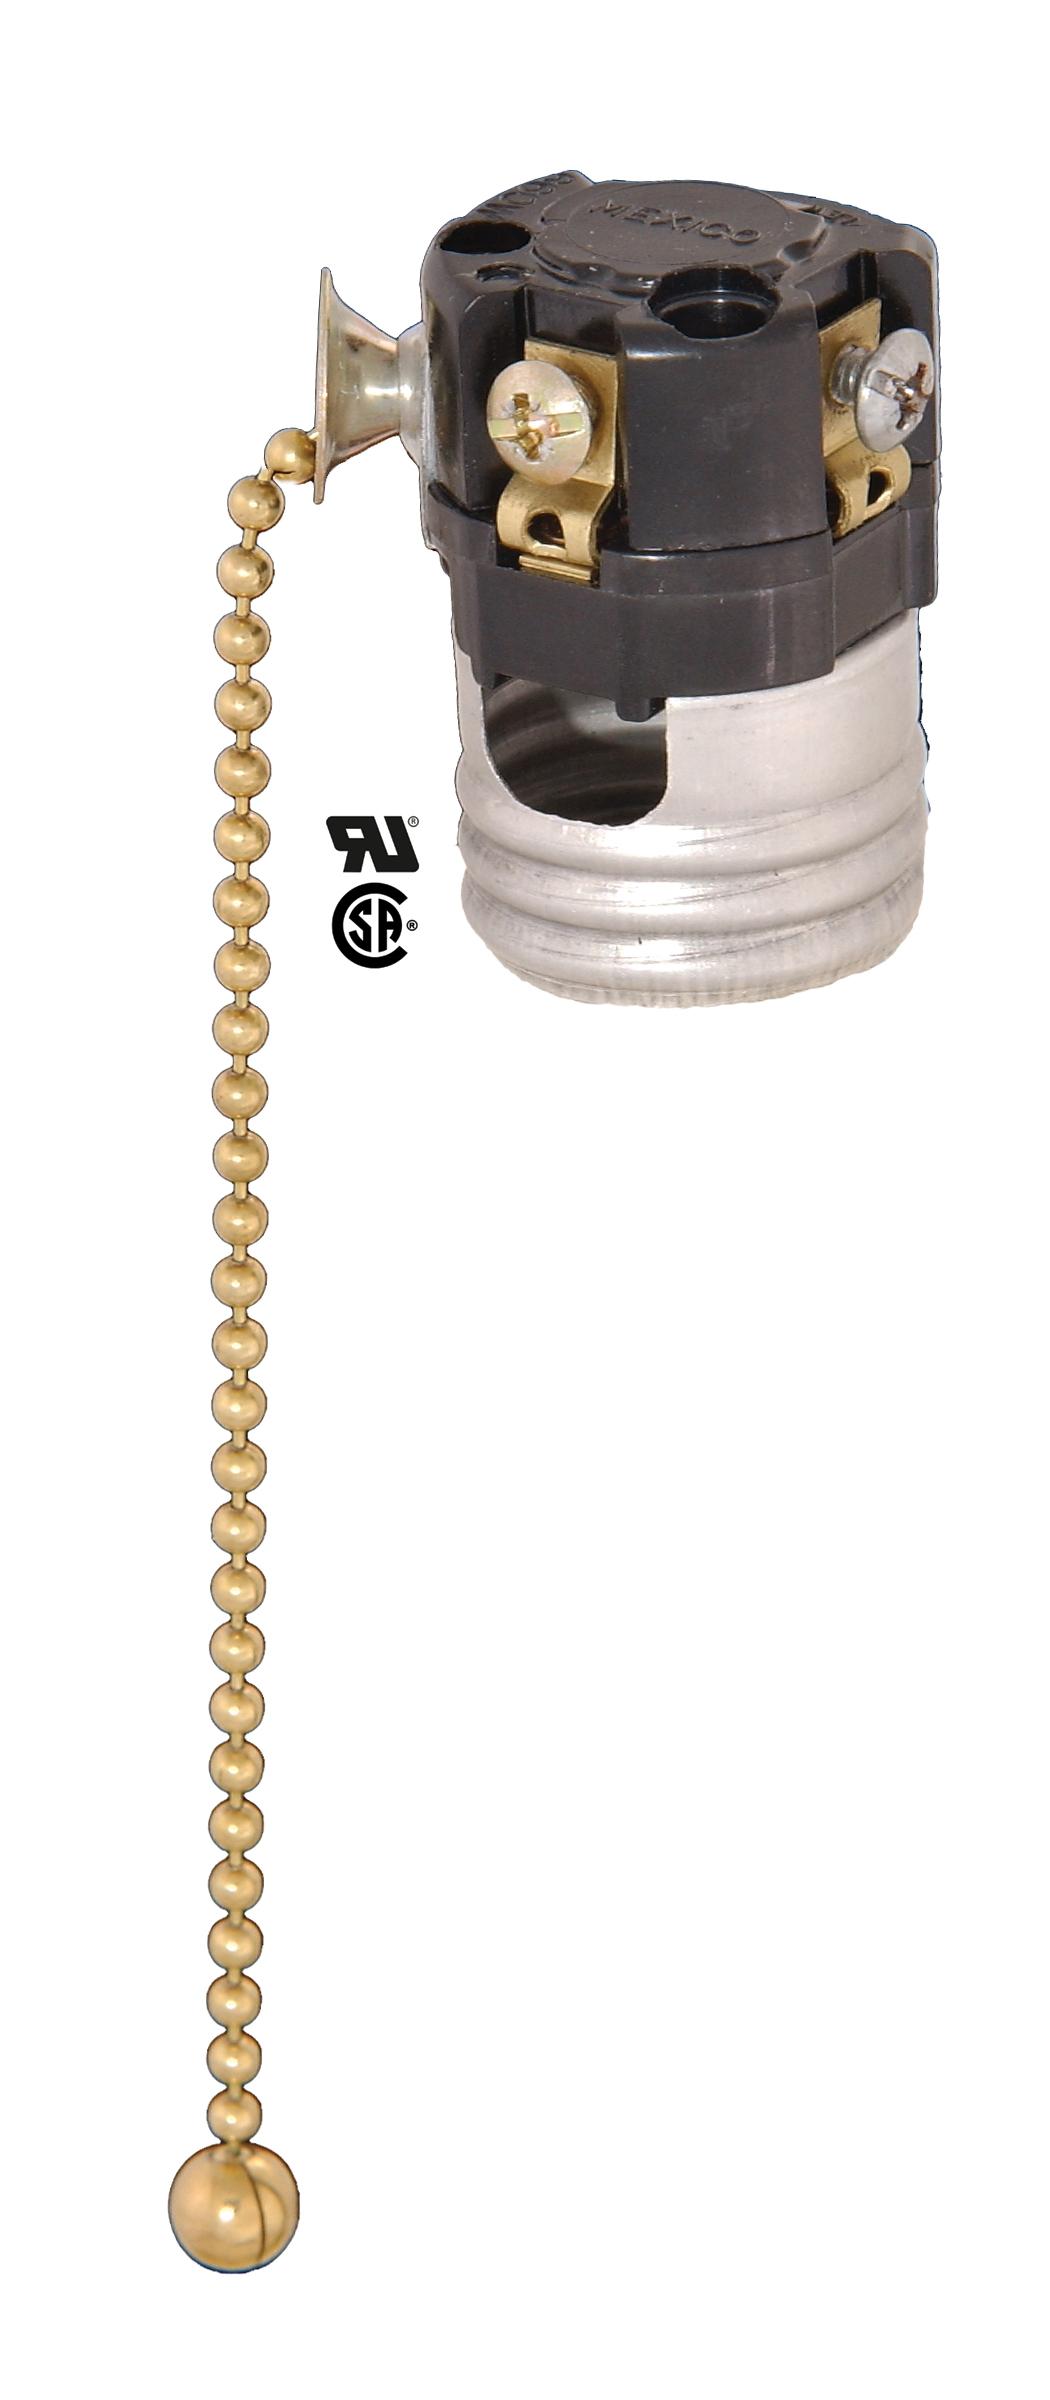 Leviton Brand Pull Chain Socket Interior 48210 B Amp P Lamp